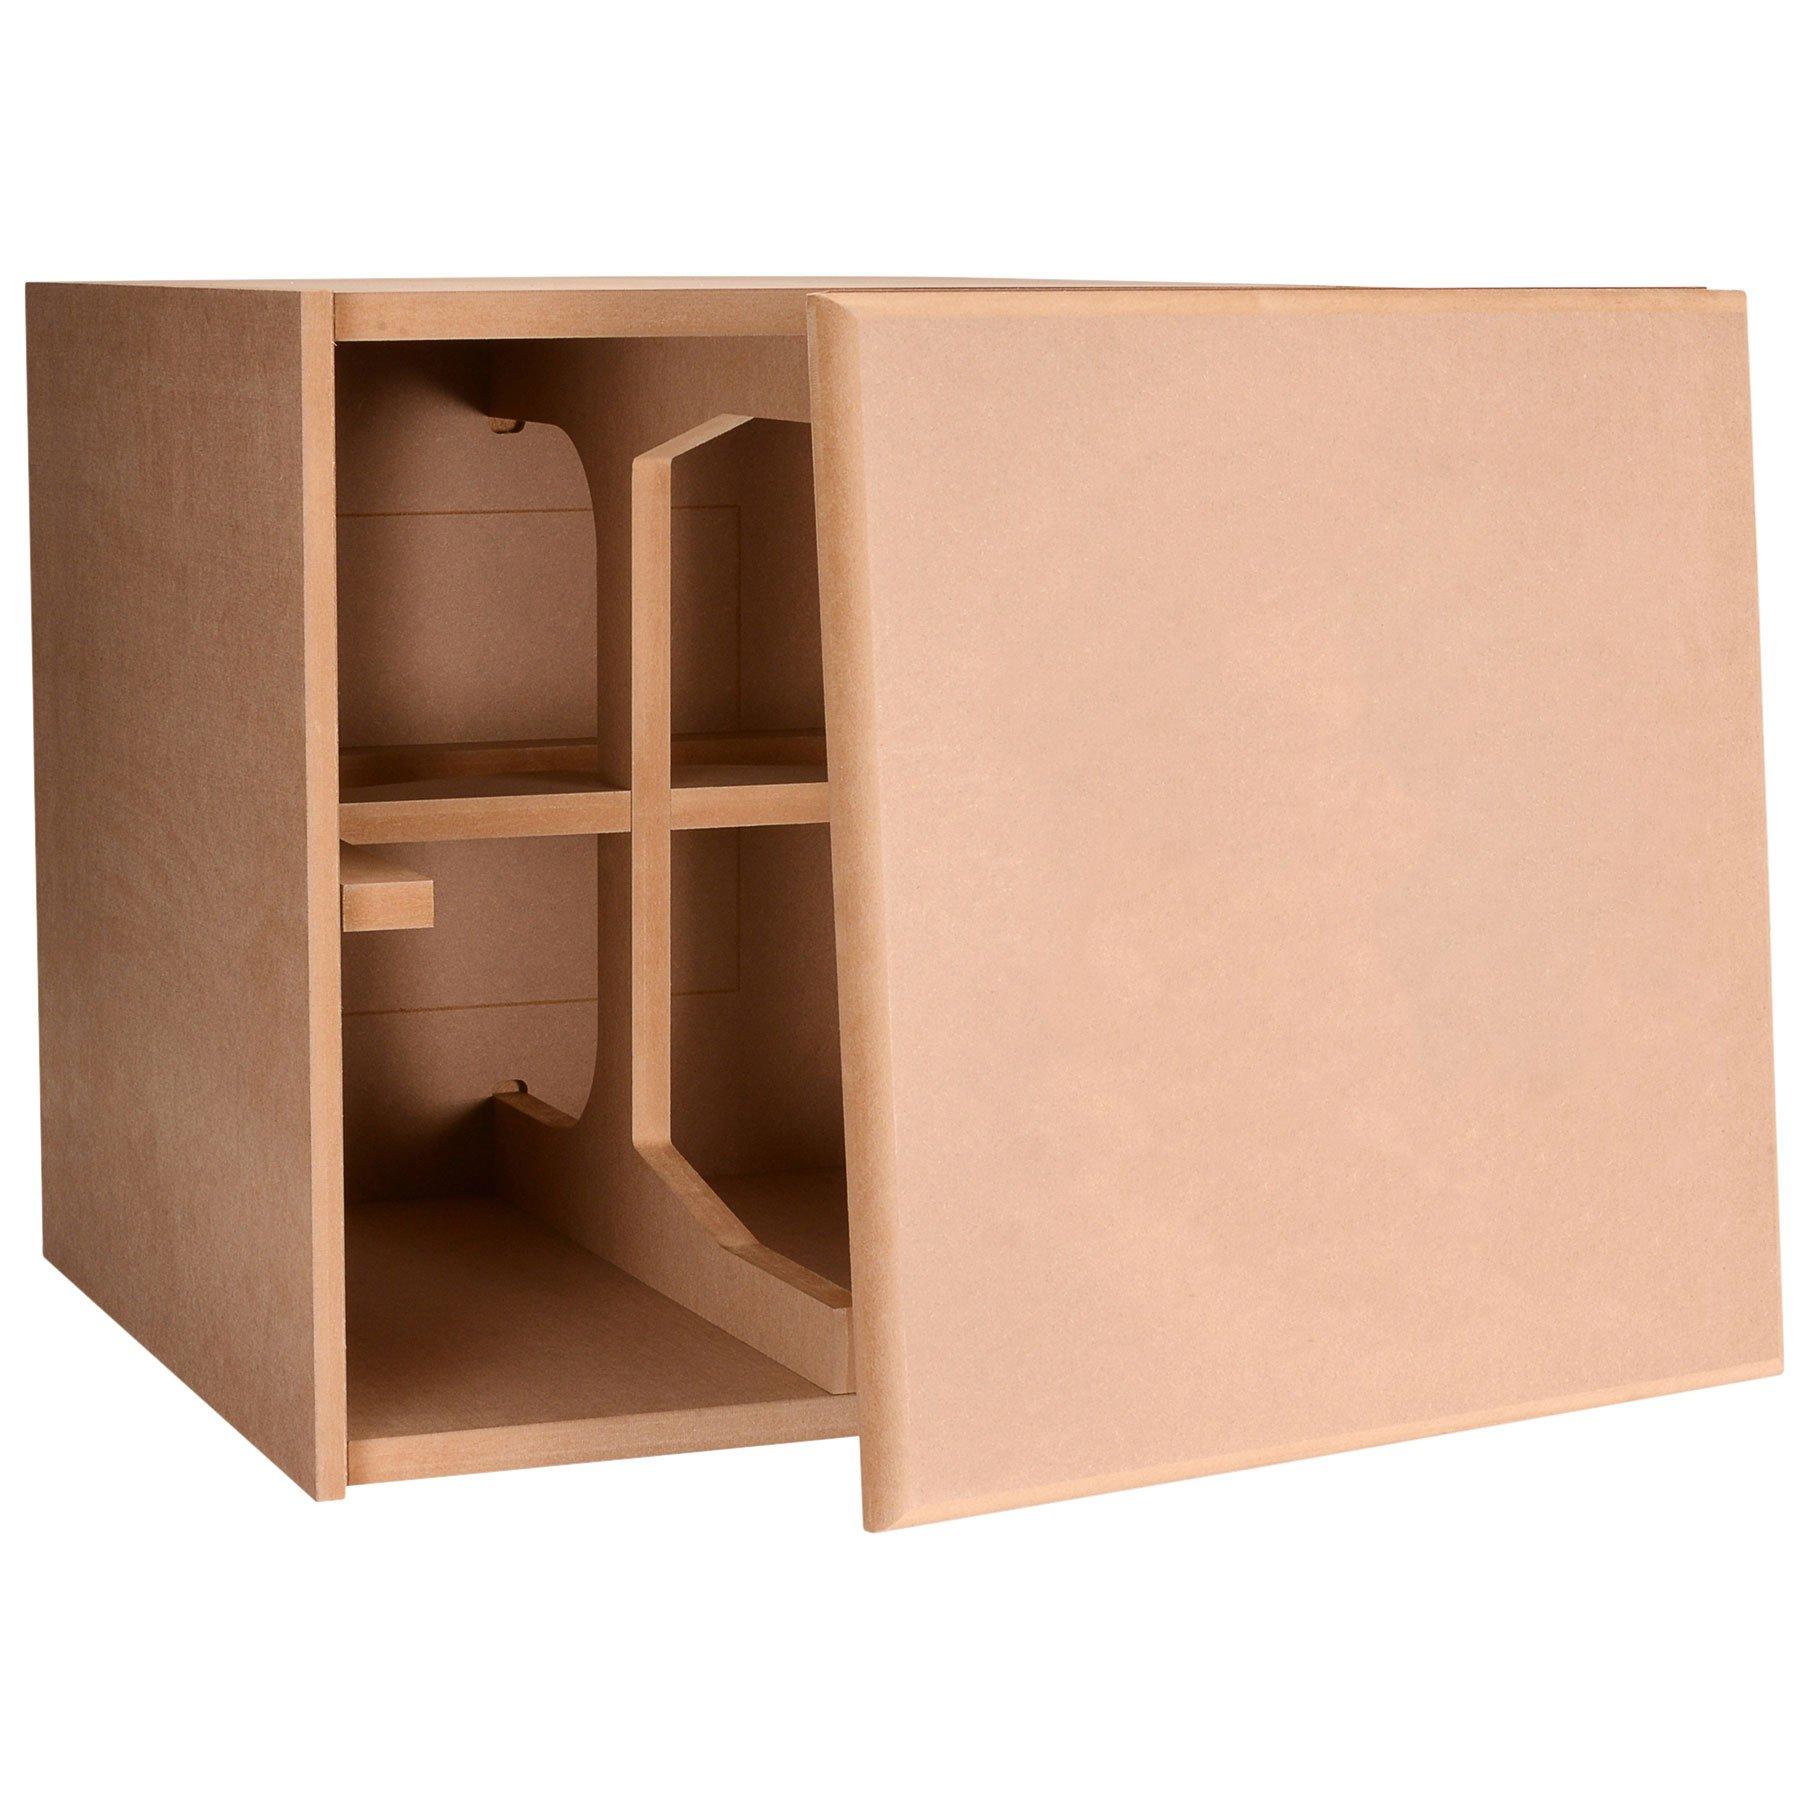 Knock-Down MDF 3.0 cu. ft. Cubic Foot Subwoofer Cabinet